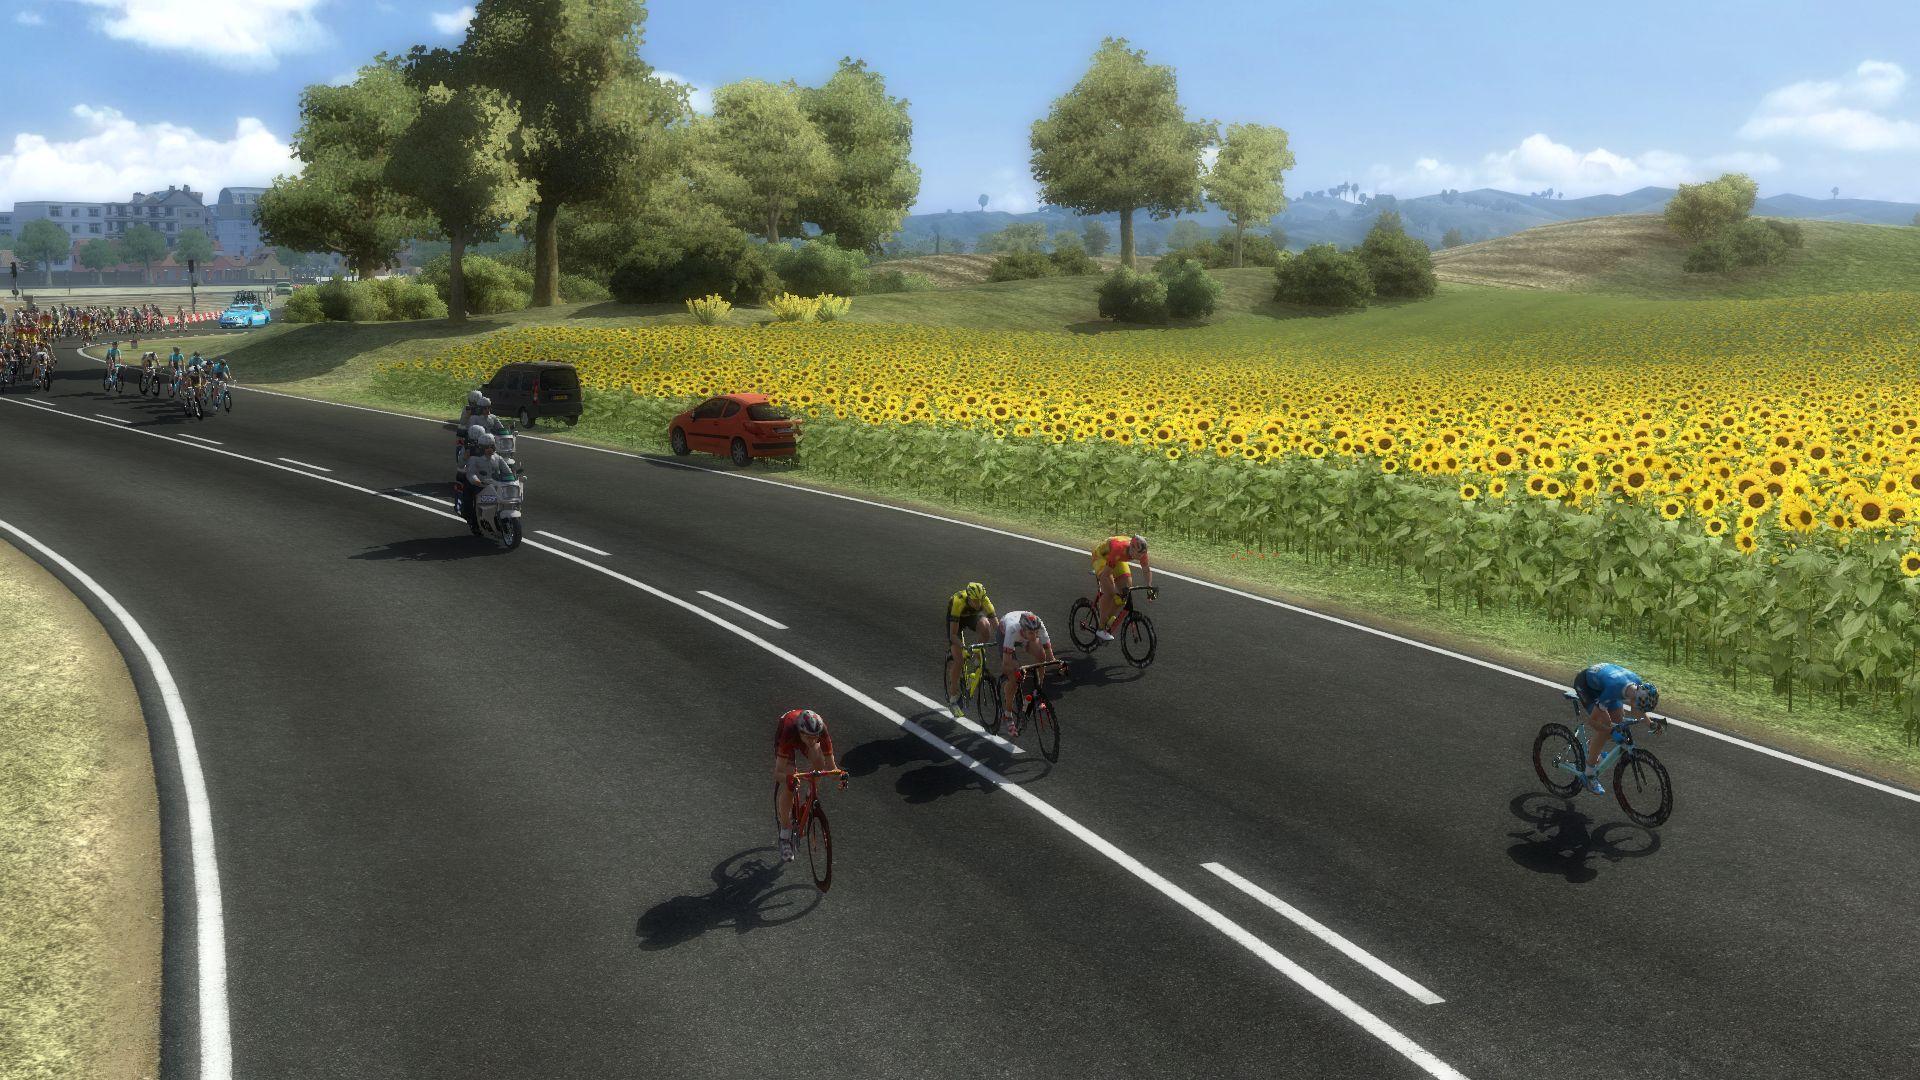 pcmdaily.com/images/mg/2020/Reports/GTM/Giro/S10/mg20_giro_s10_33.jpg